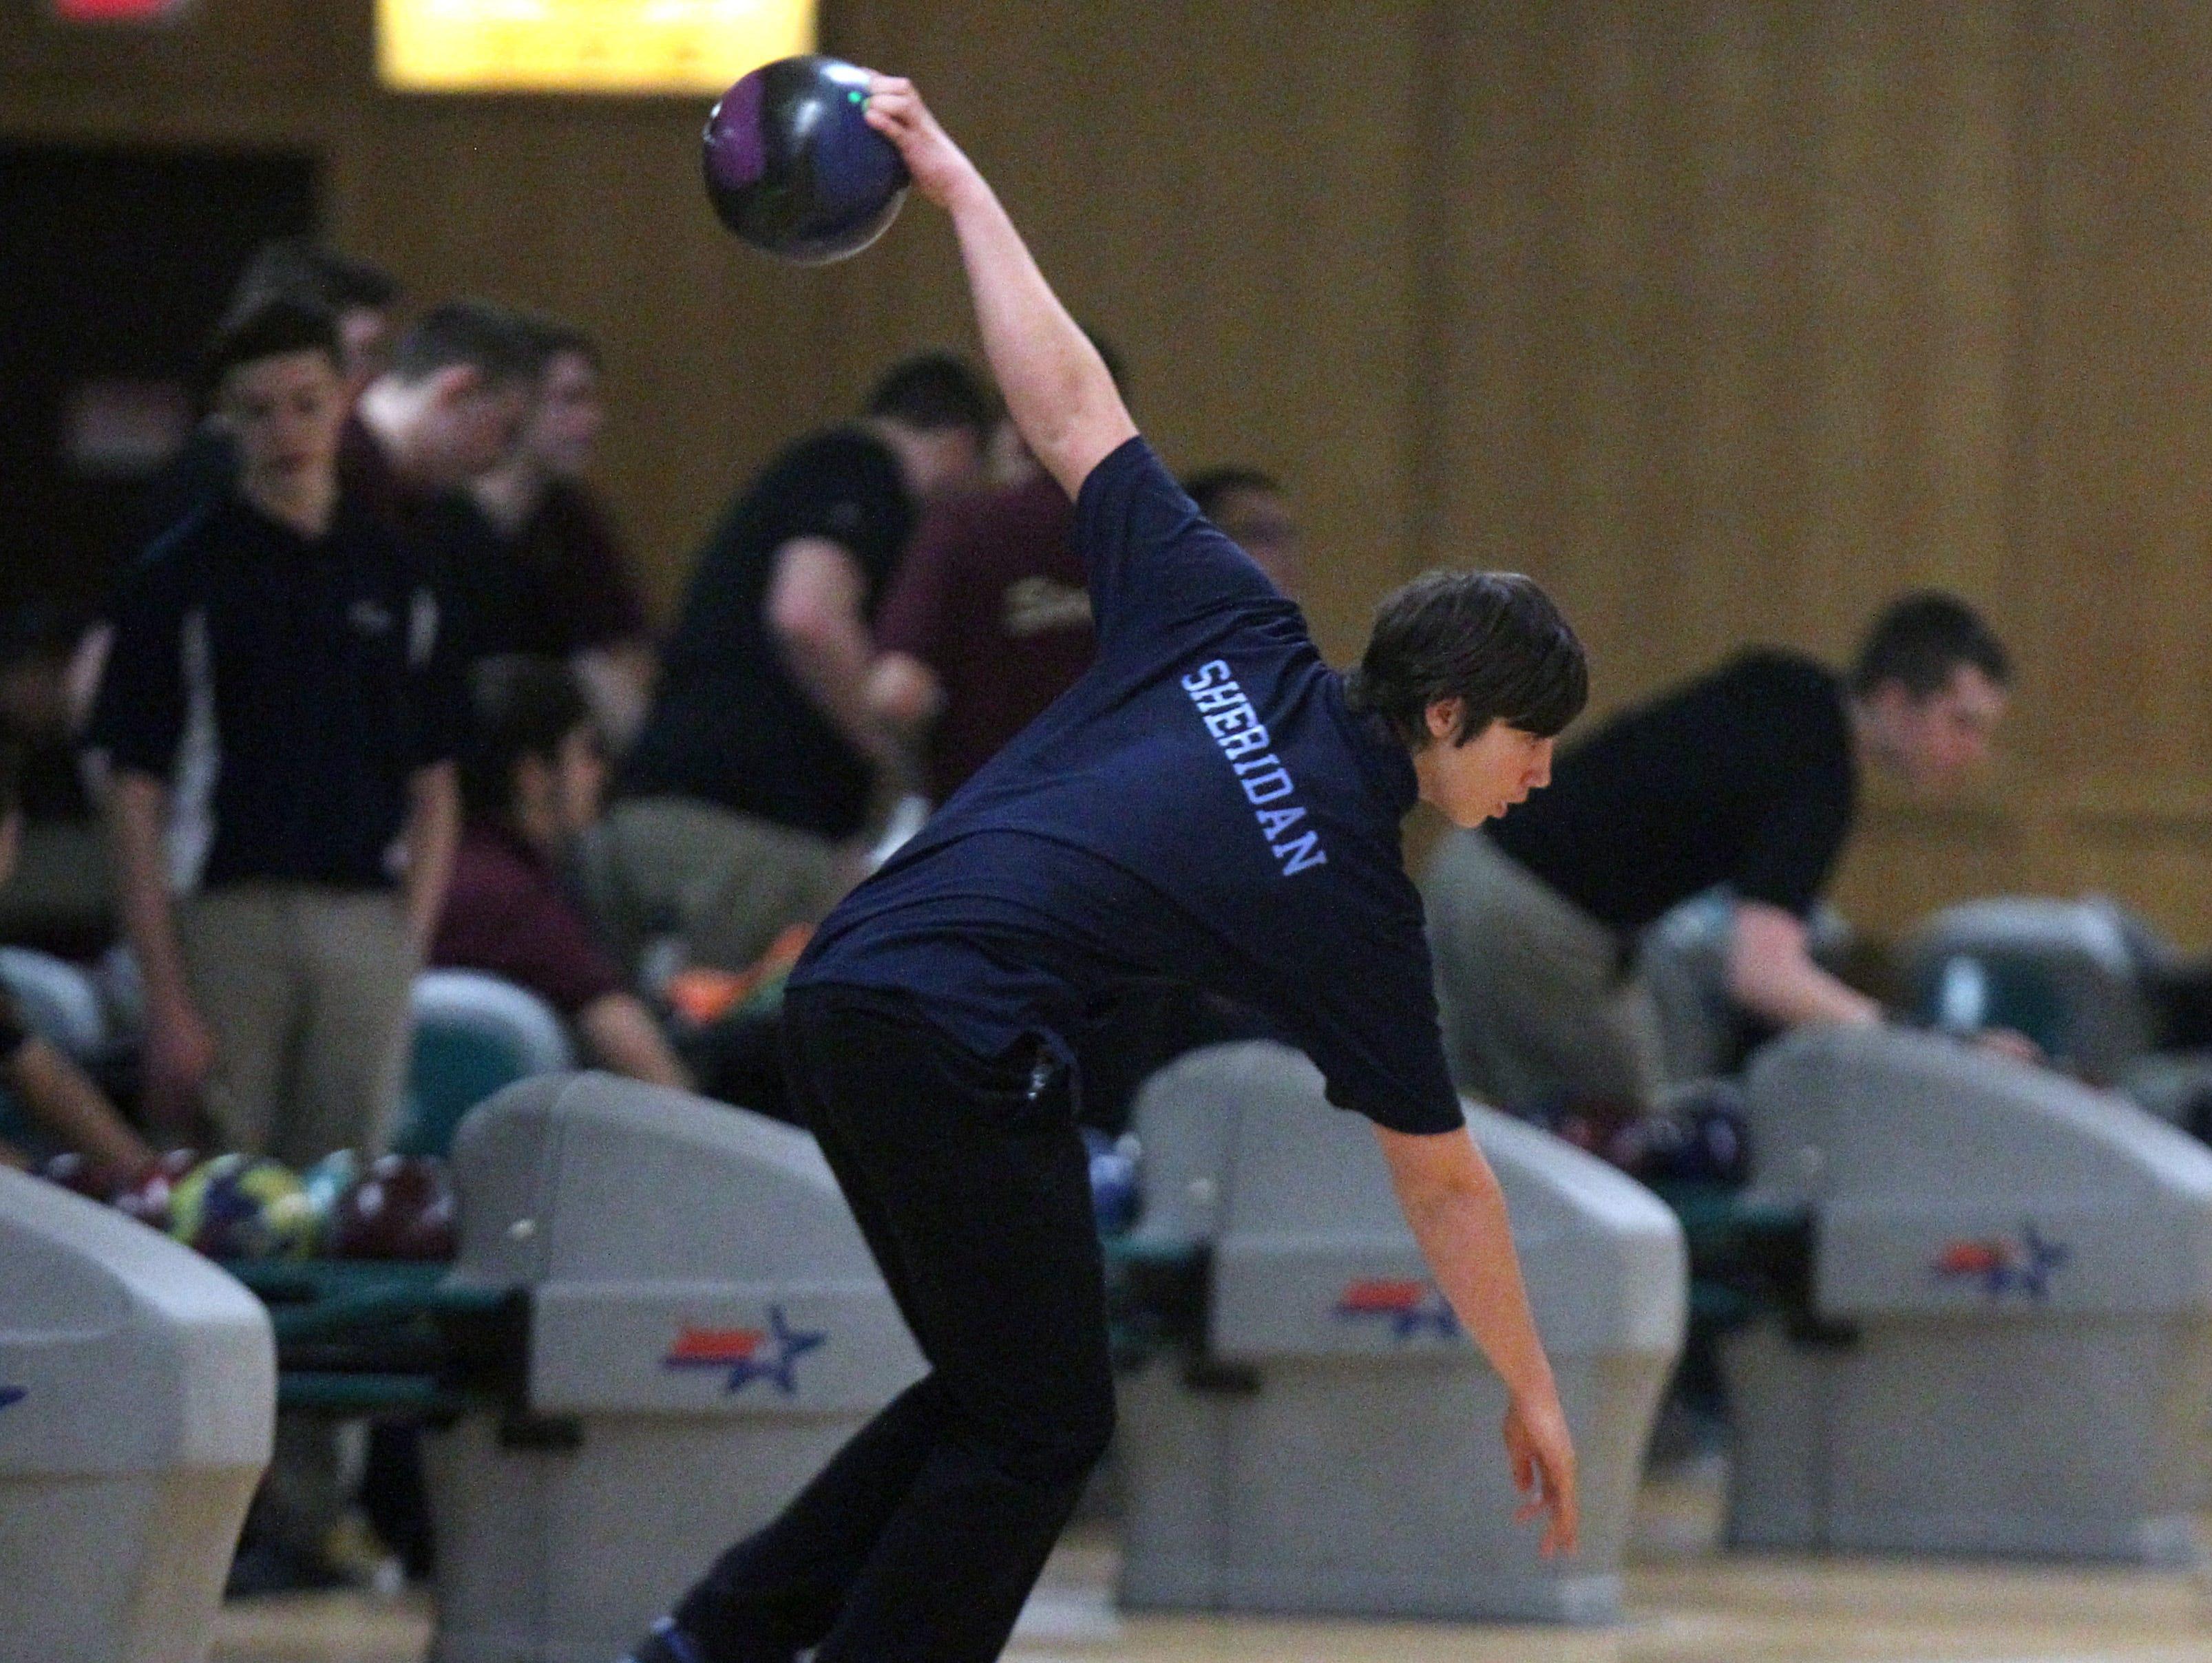 John Jay High School's Michael Sheridan bowls in the Section 1 tournament at Fishkill Bowl on Feb. 7.